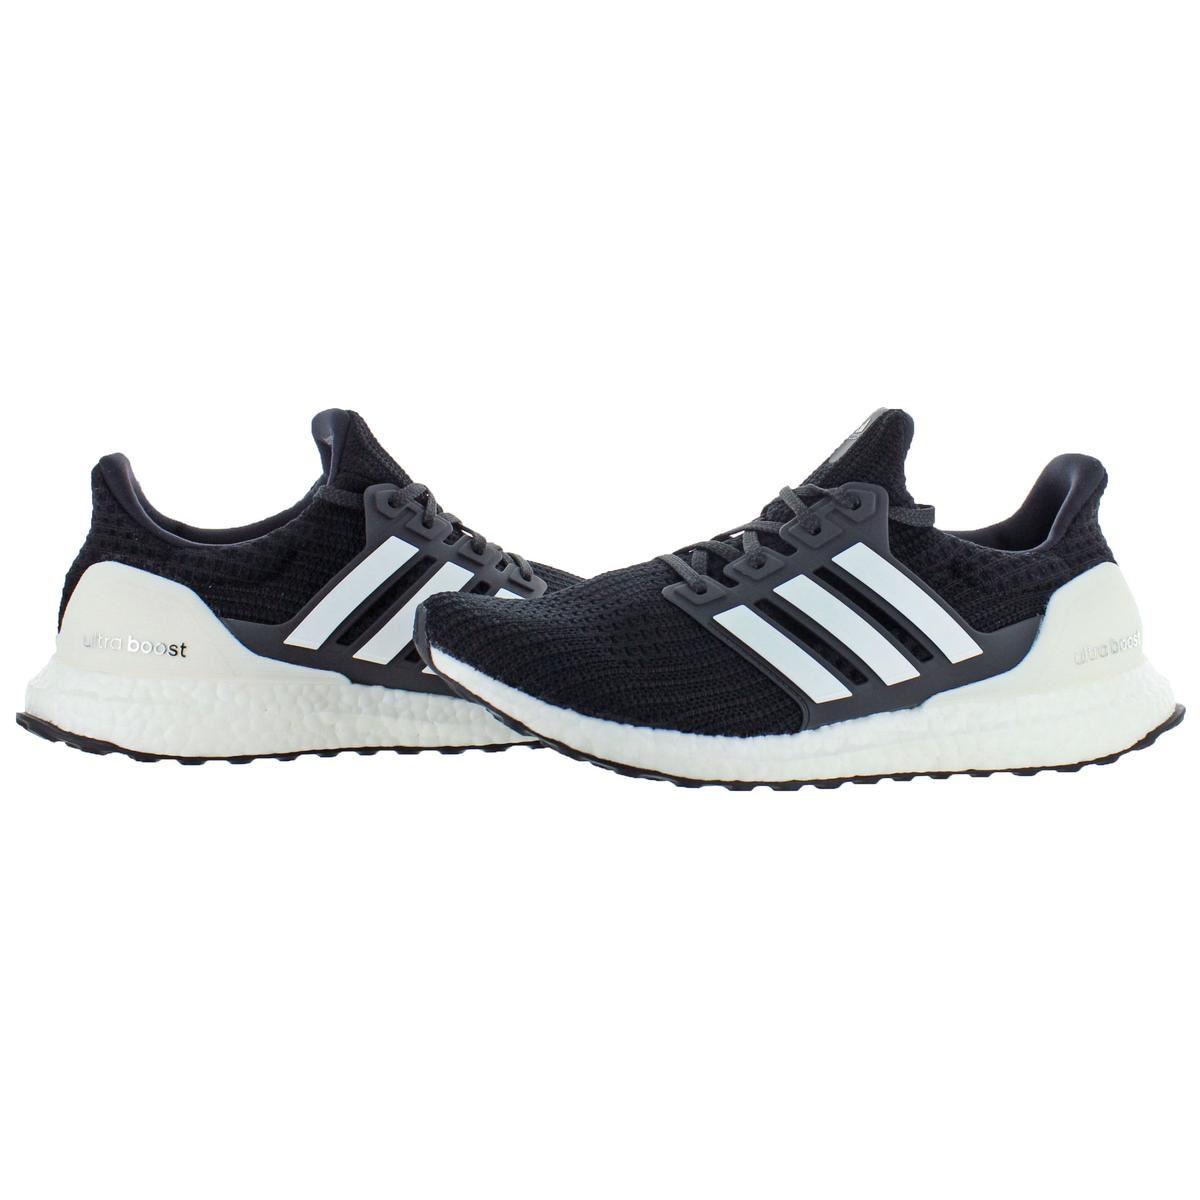 666cde147 Adidas Mens Ultraboost Primeknit Running Shoes